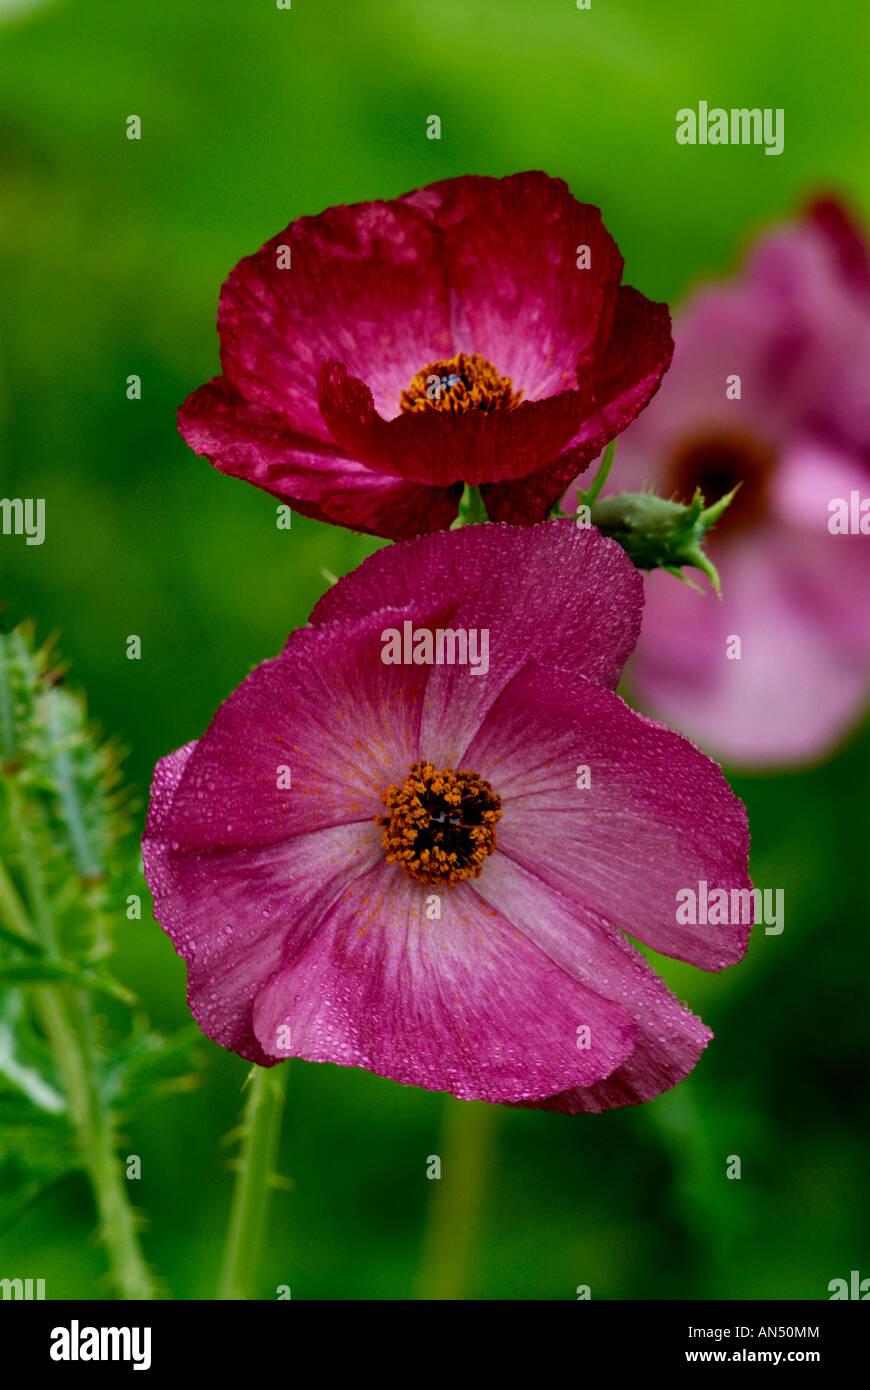 Rose Prickly poppy, Argemone sanguinea, Frio county, Texas grows on ...